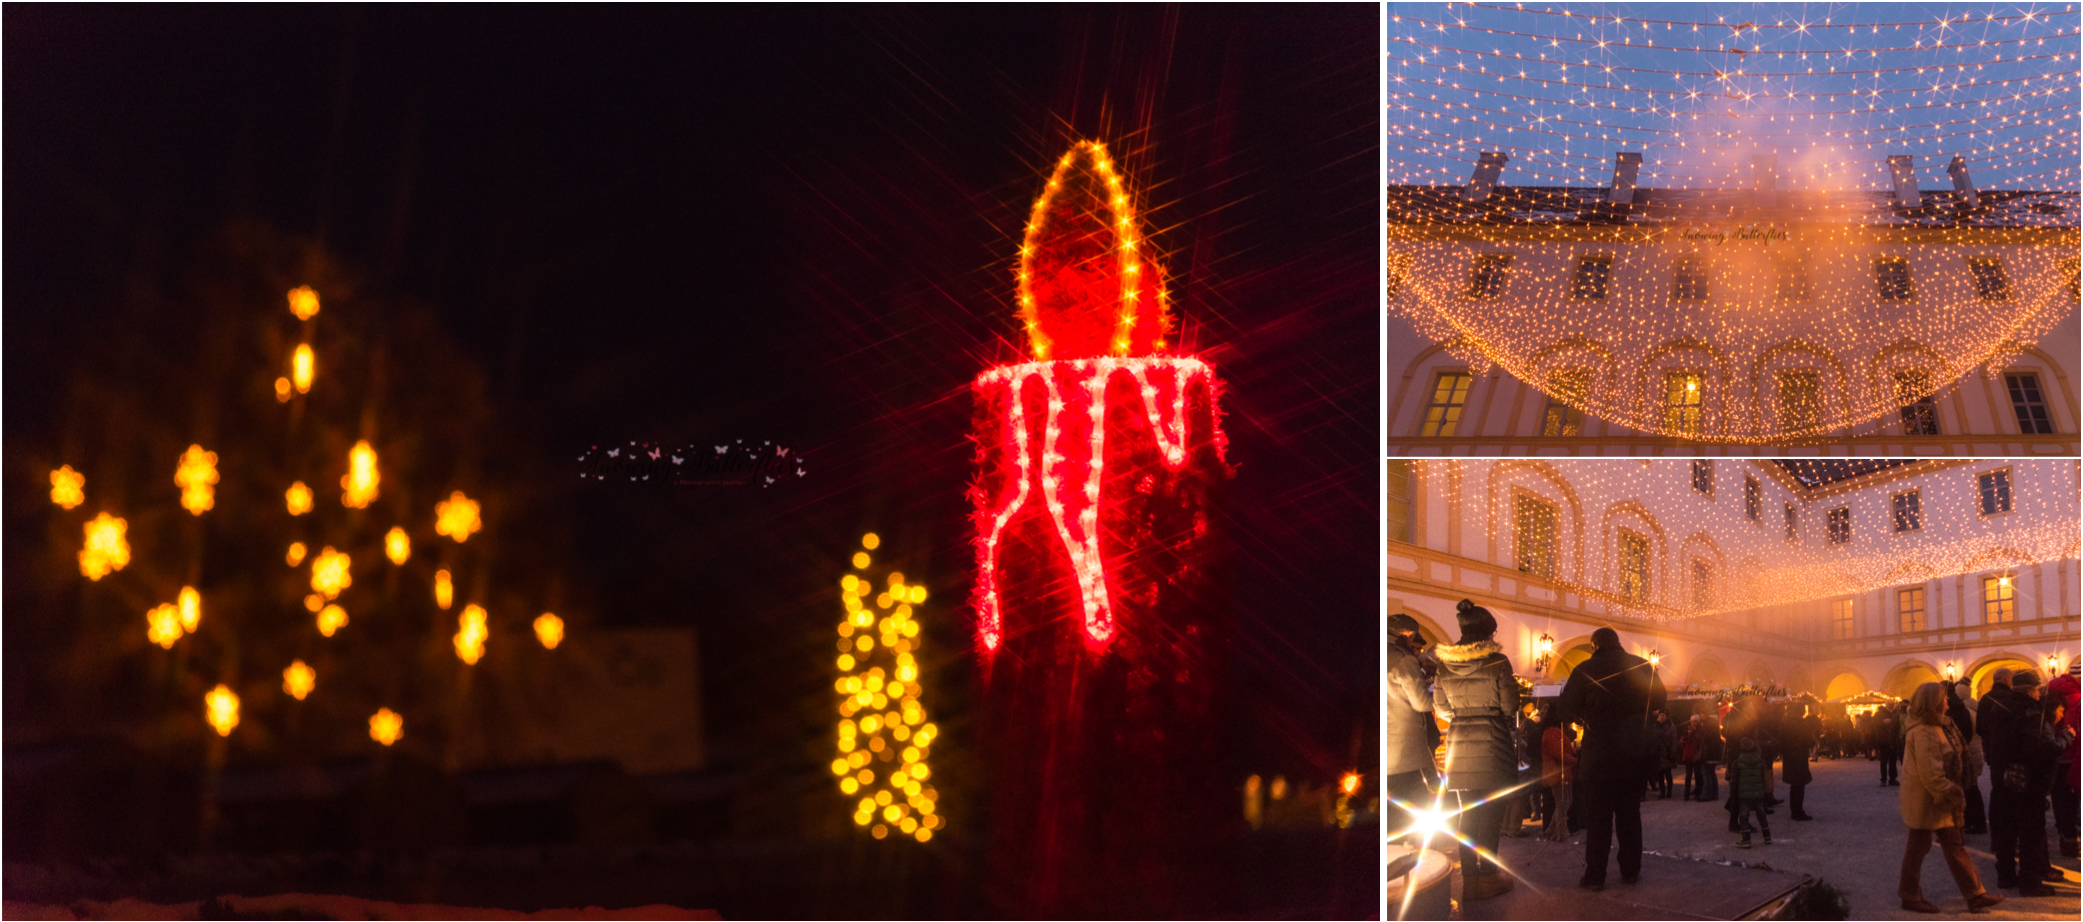 snowing butterflies, mariana perrone, austria, vienna, schloss hof, travel photography, europe, christmas